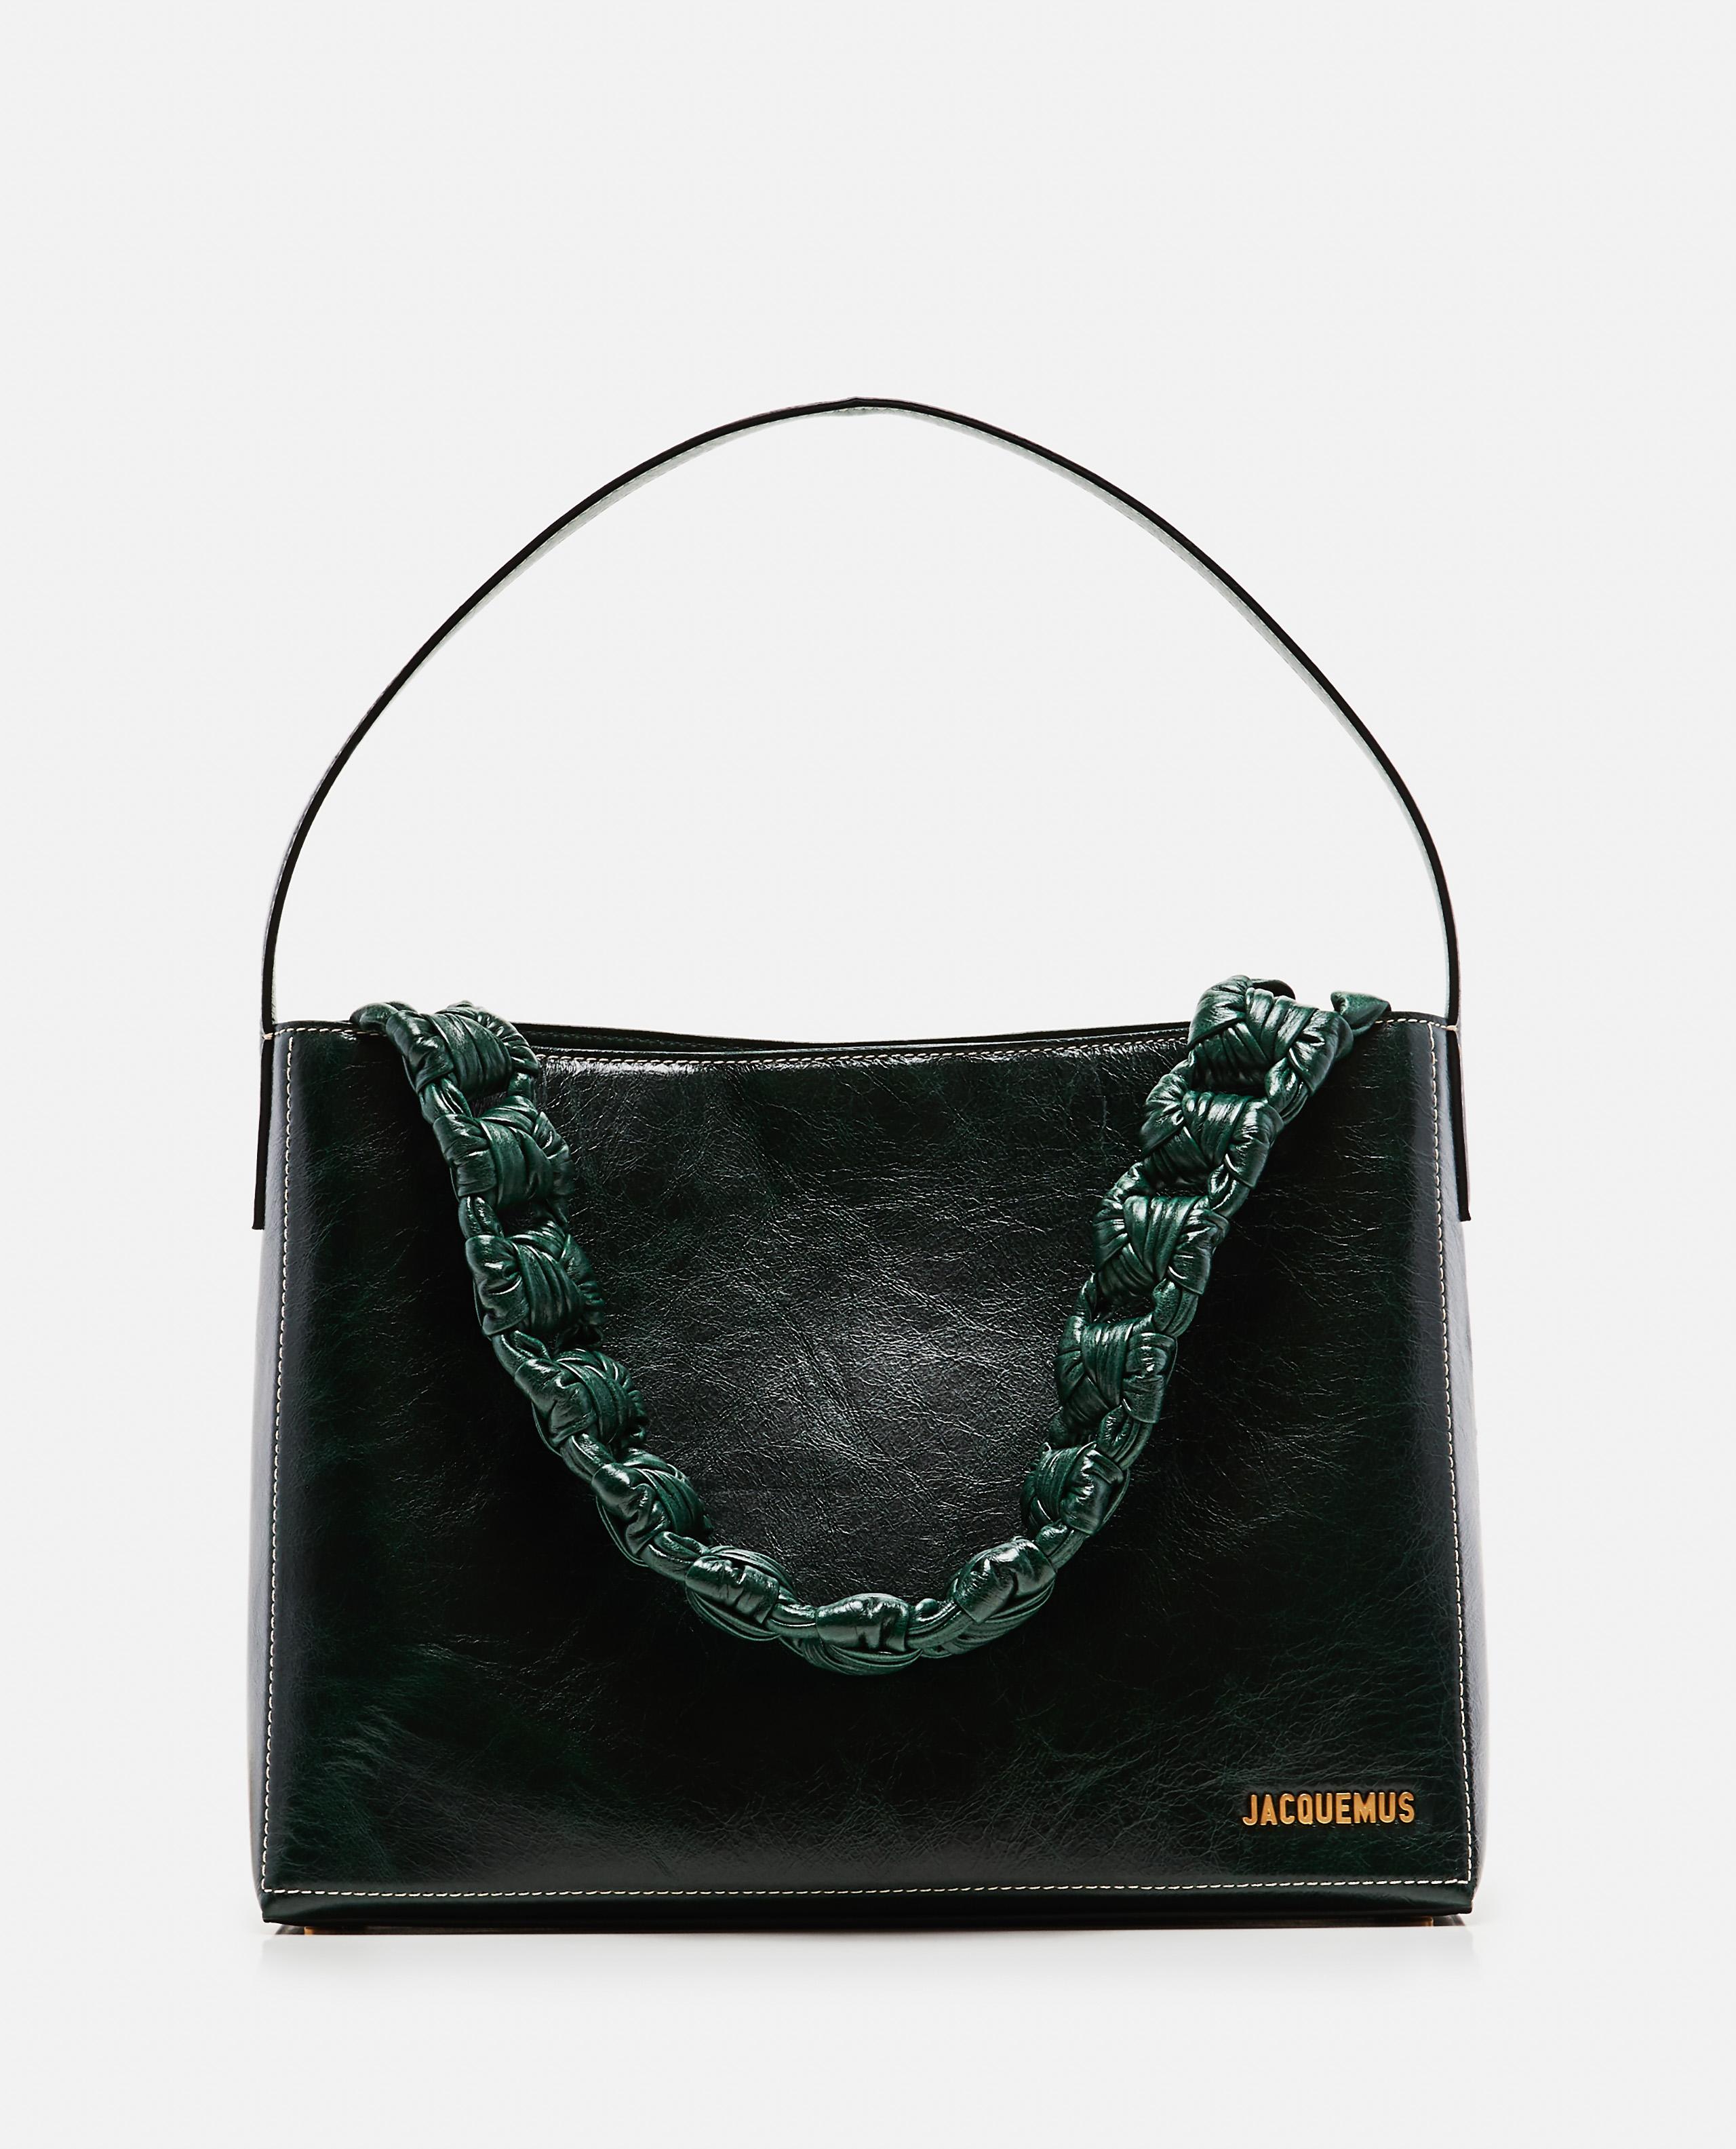 Le Grand Sac Noeud handbag